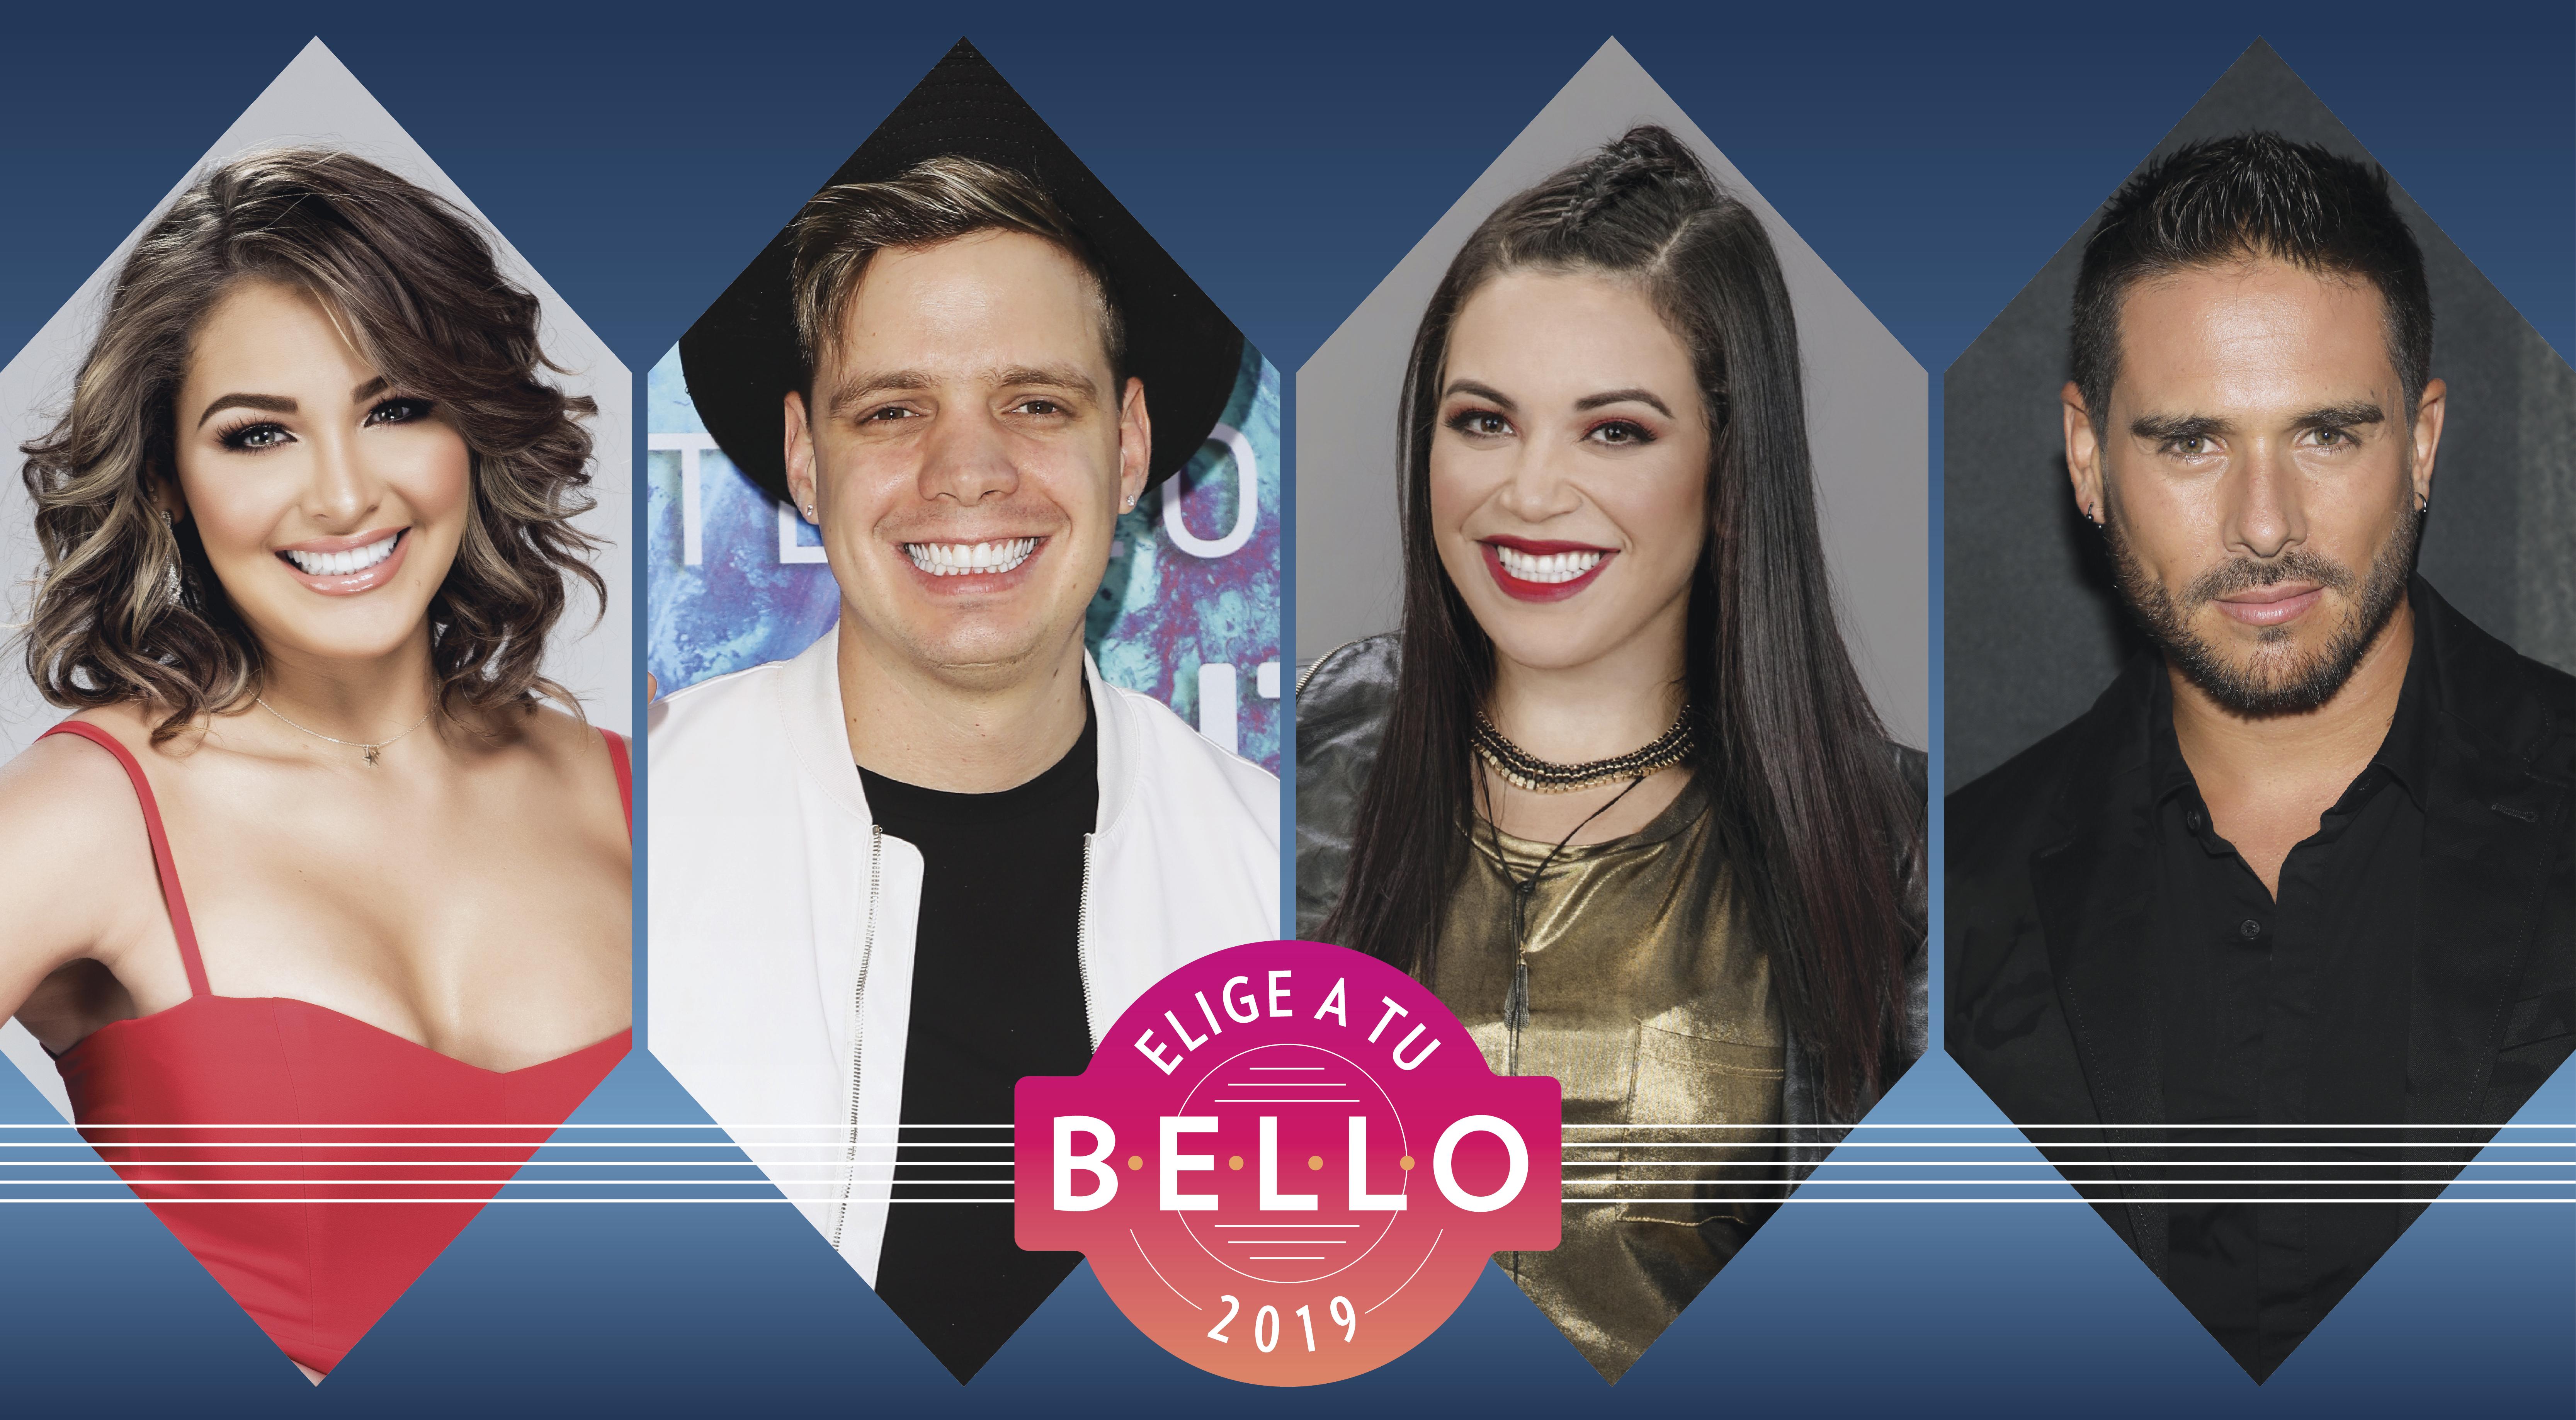 Elige a tu bello-People en Español